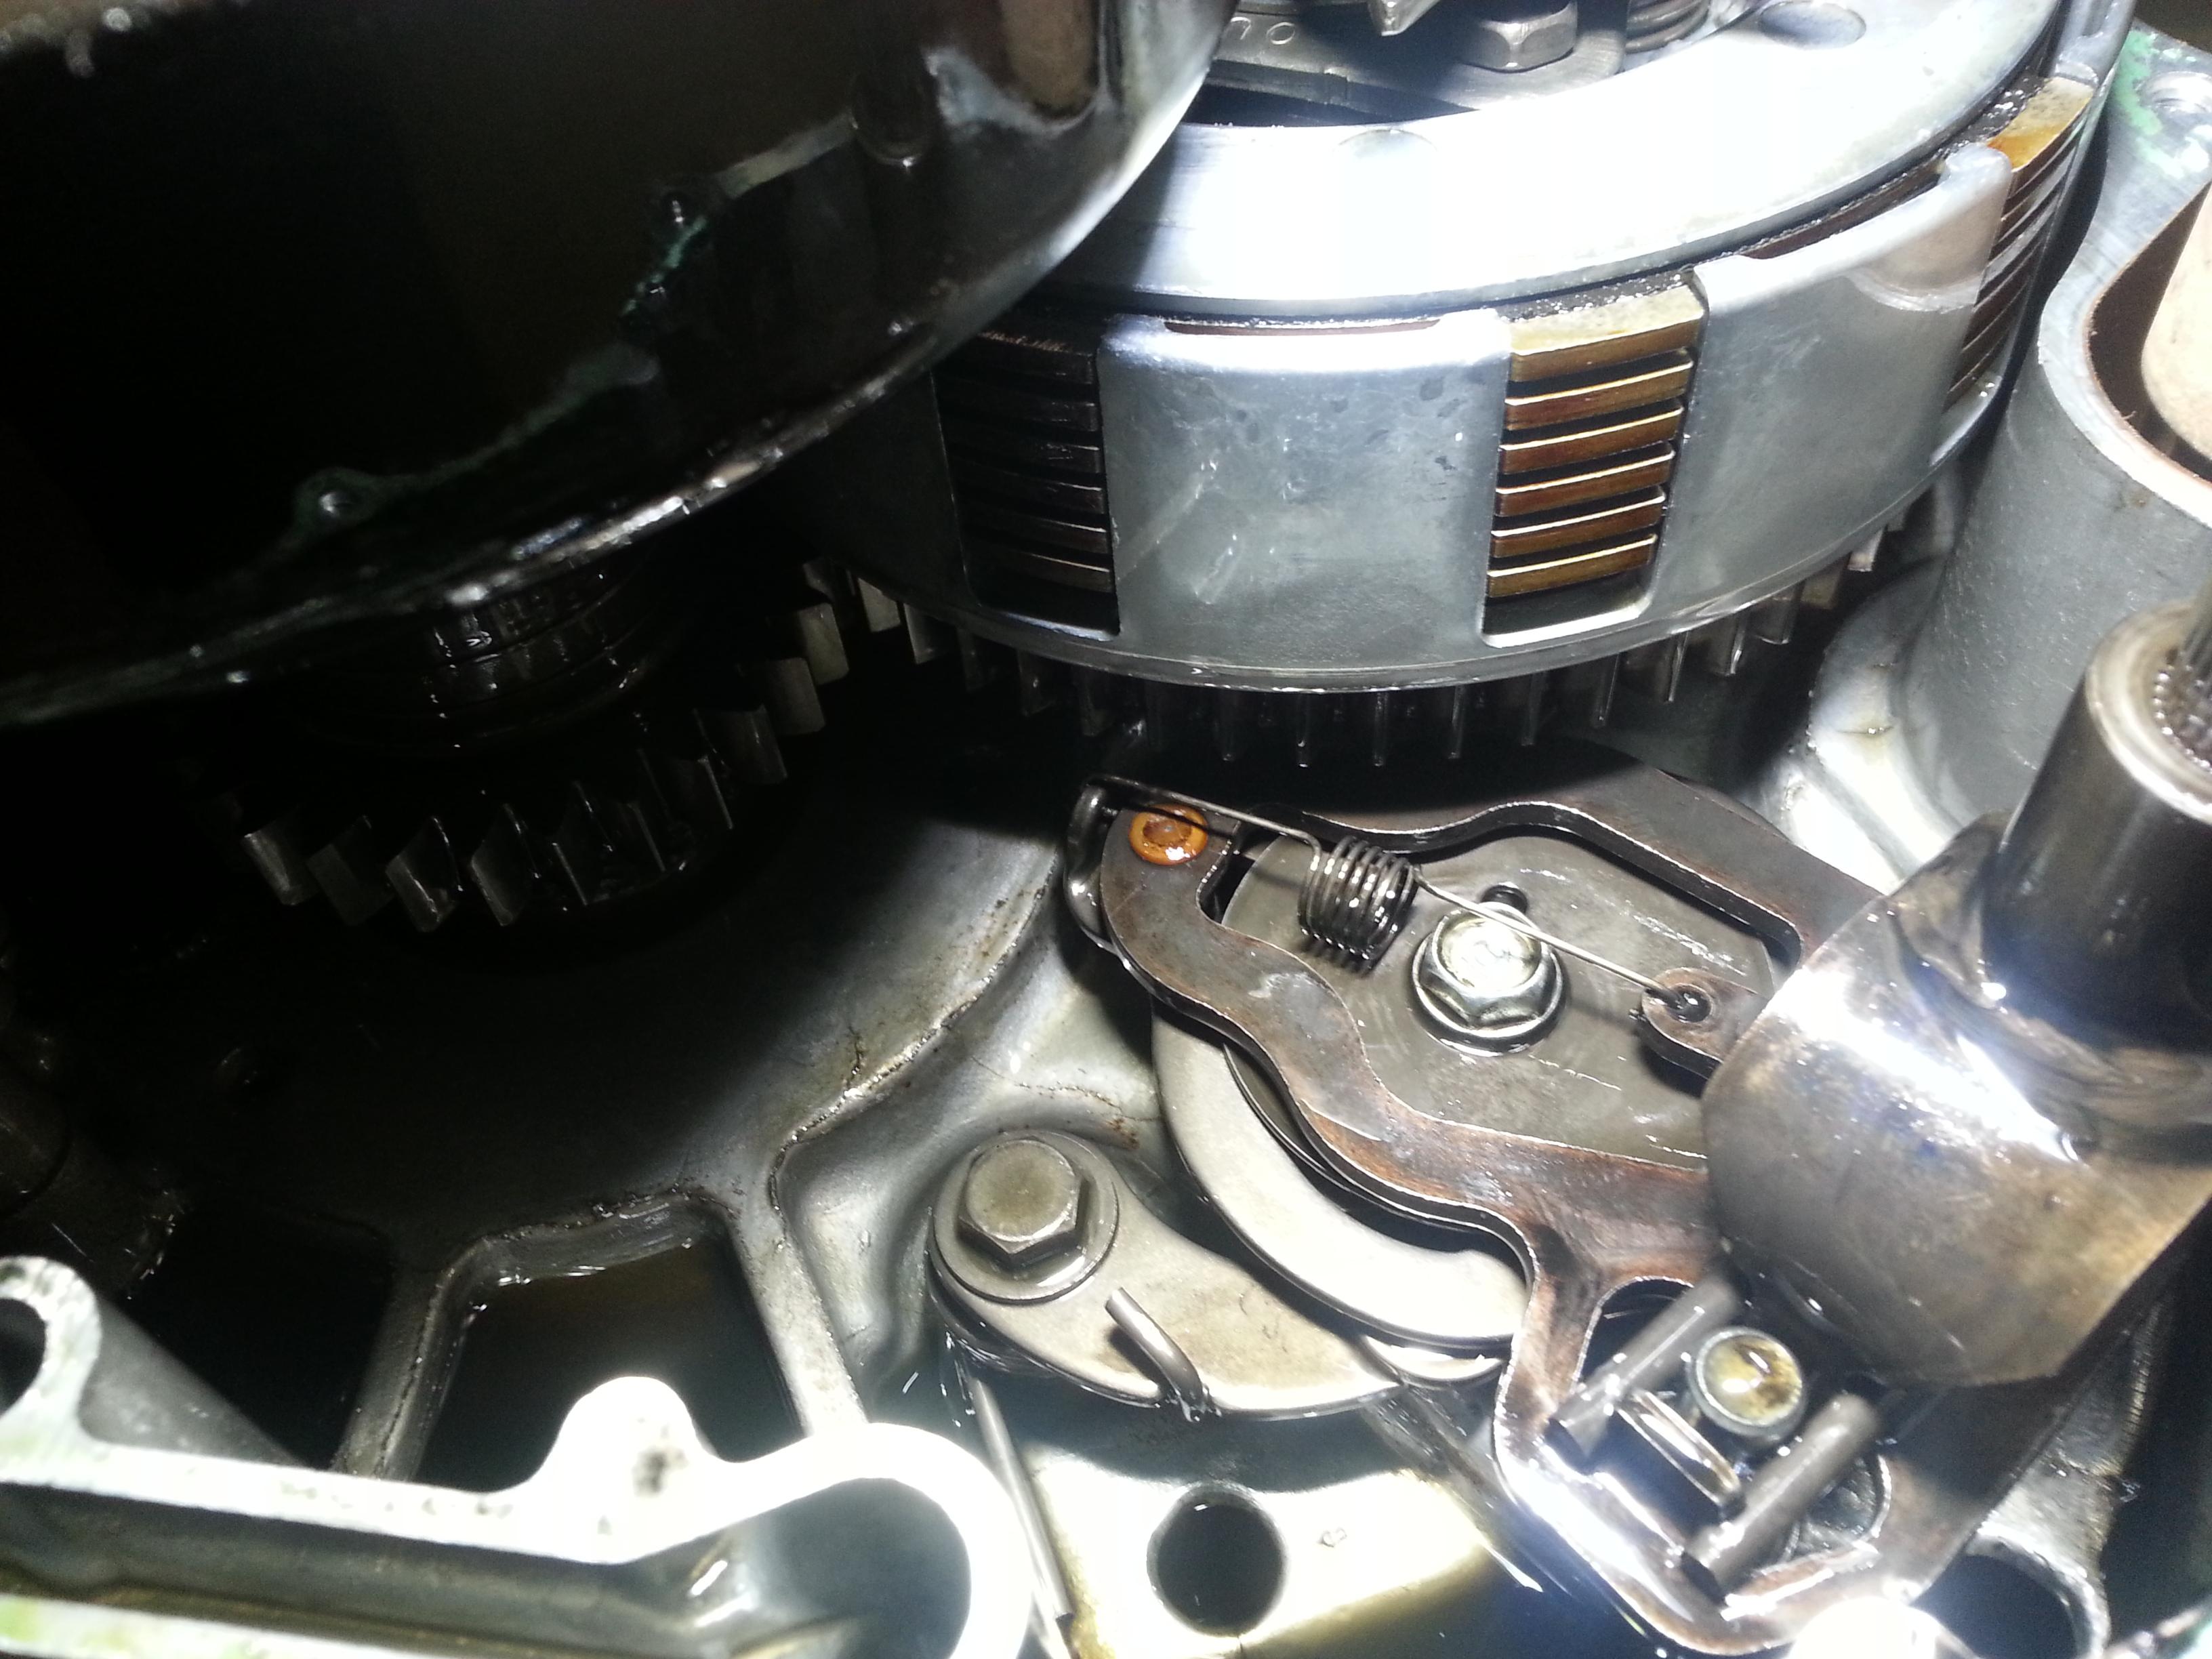 Foreman 450 es wont shift above 1st - Honda ATV Forum